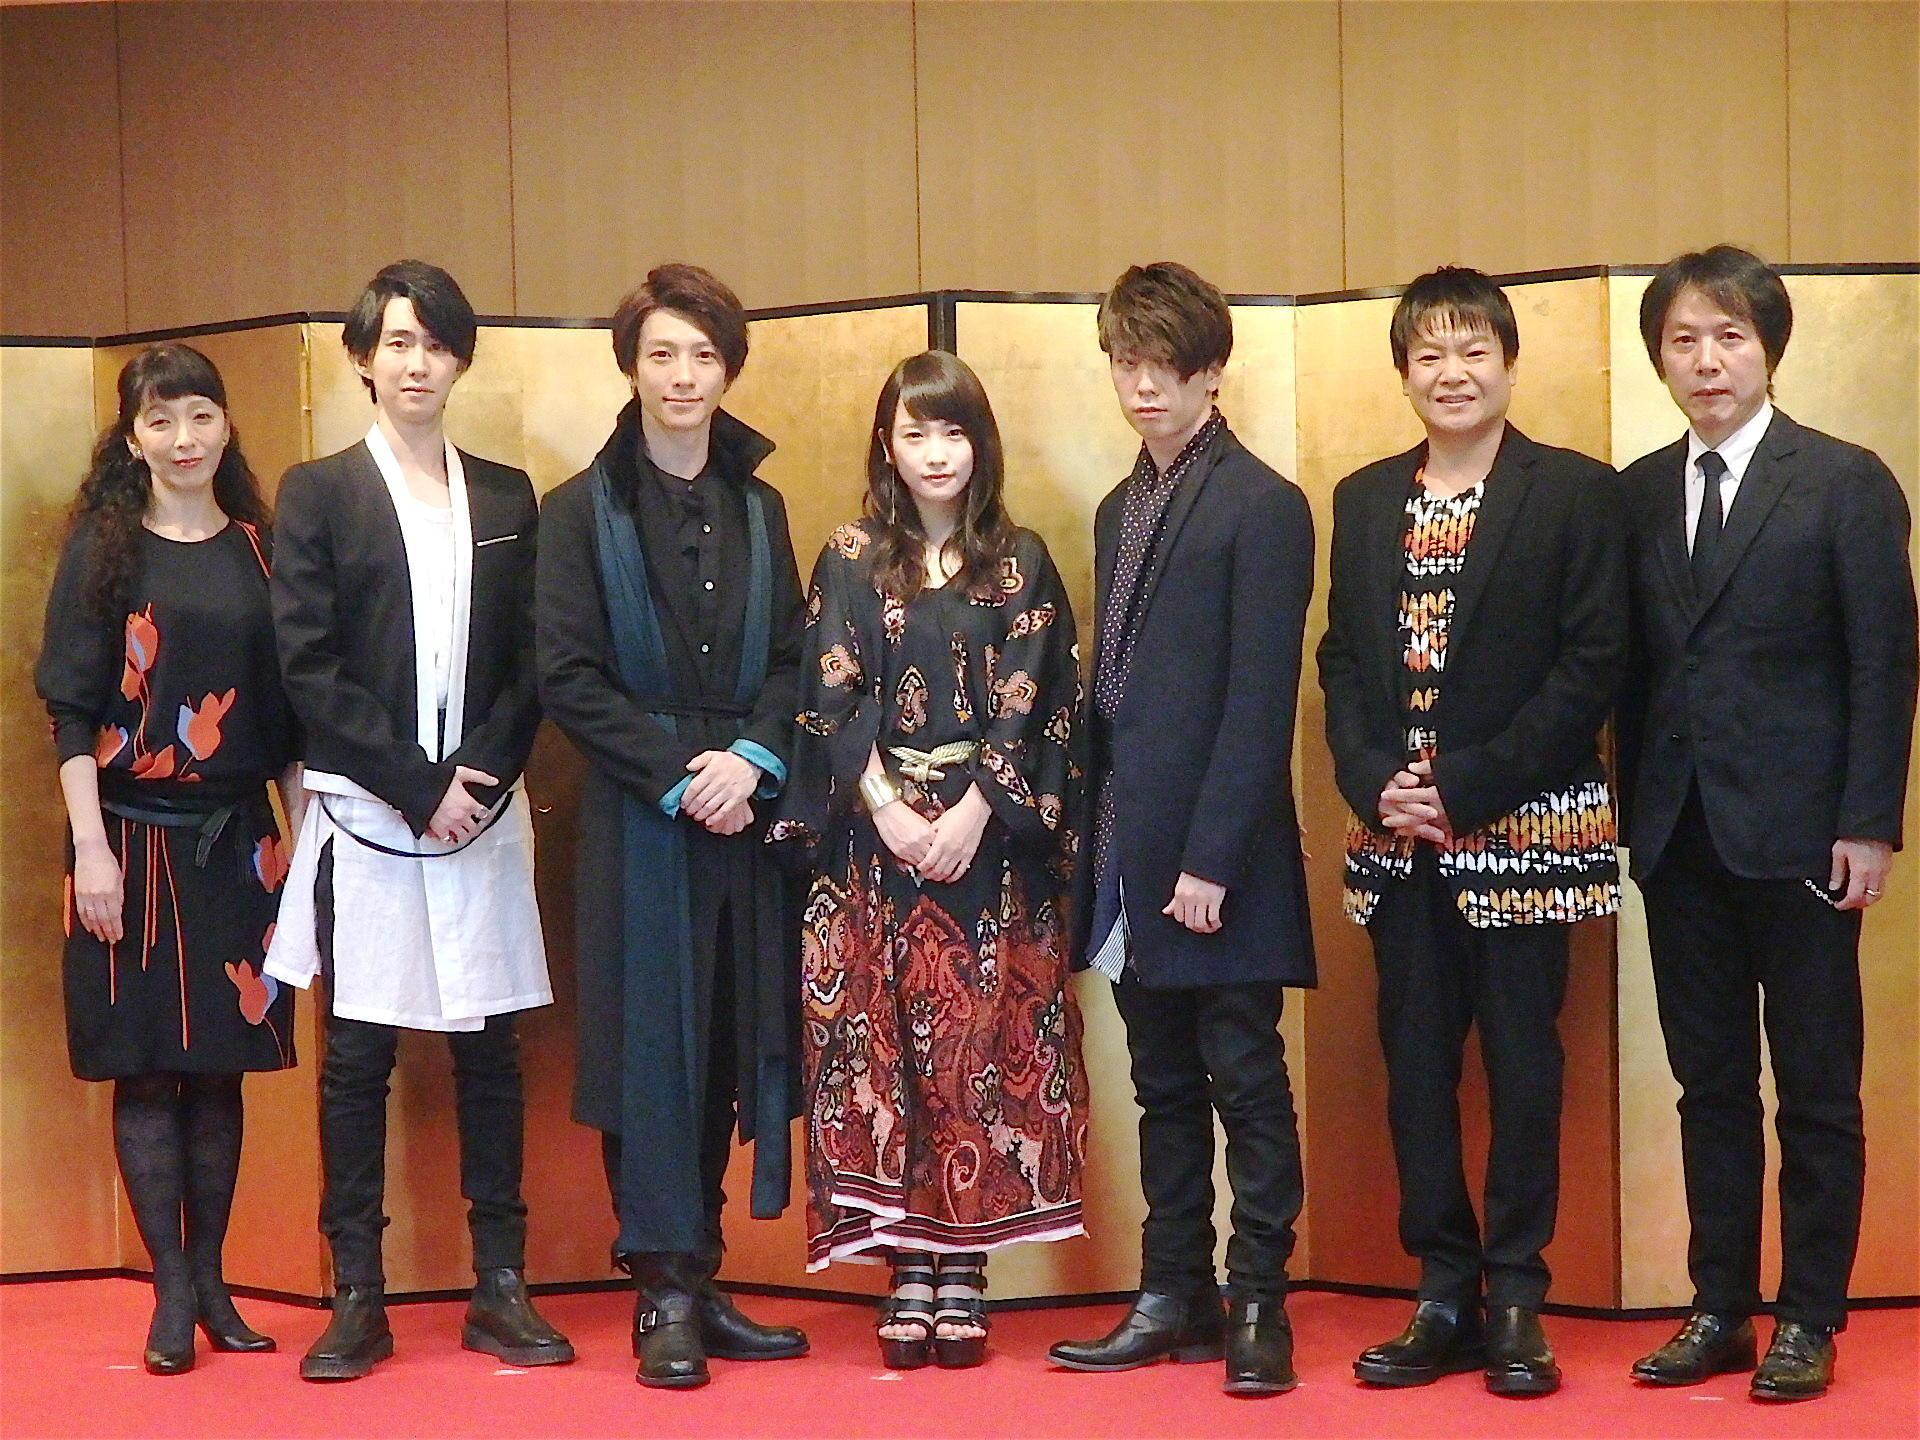 http://news.yoshimoto.co.jp/20160930192718-bfbbada86648c6d98a928fc99ffcb6dfdd11d851.jpg